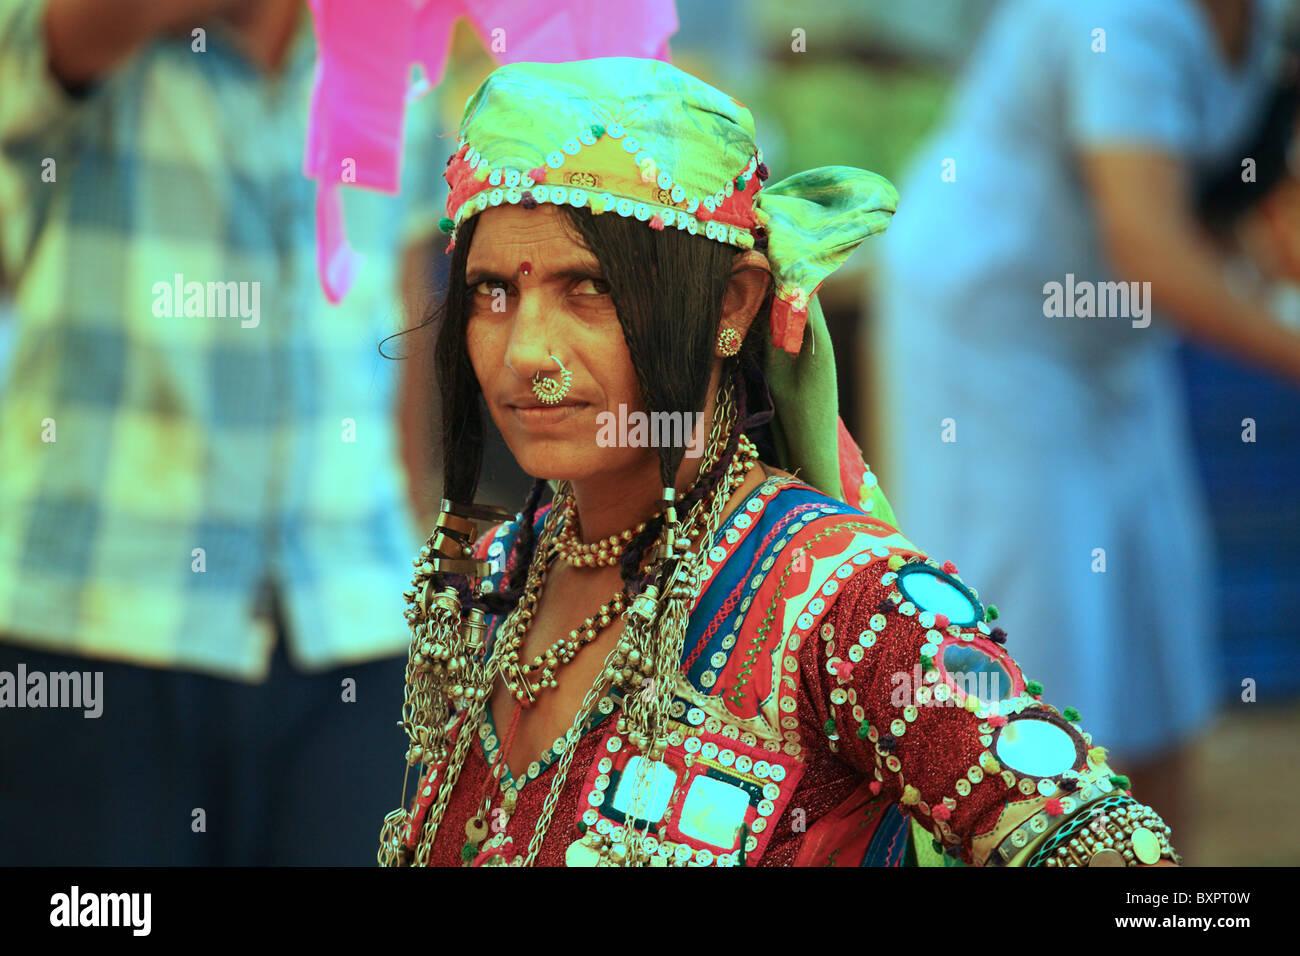 Karnatakan woman at Anjuna flea market, India Stock Photo